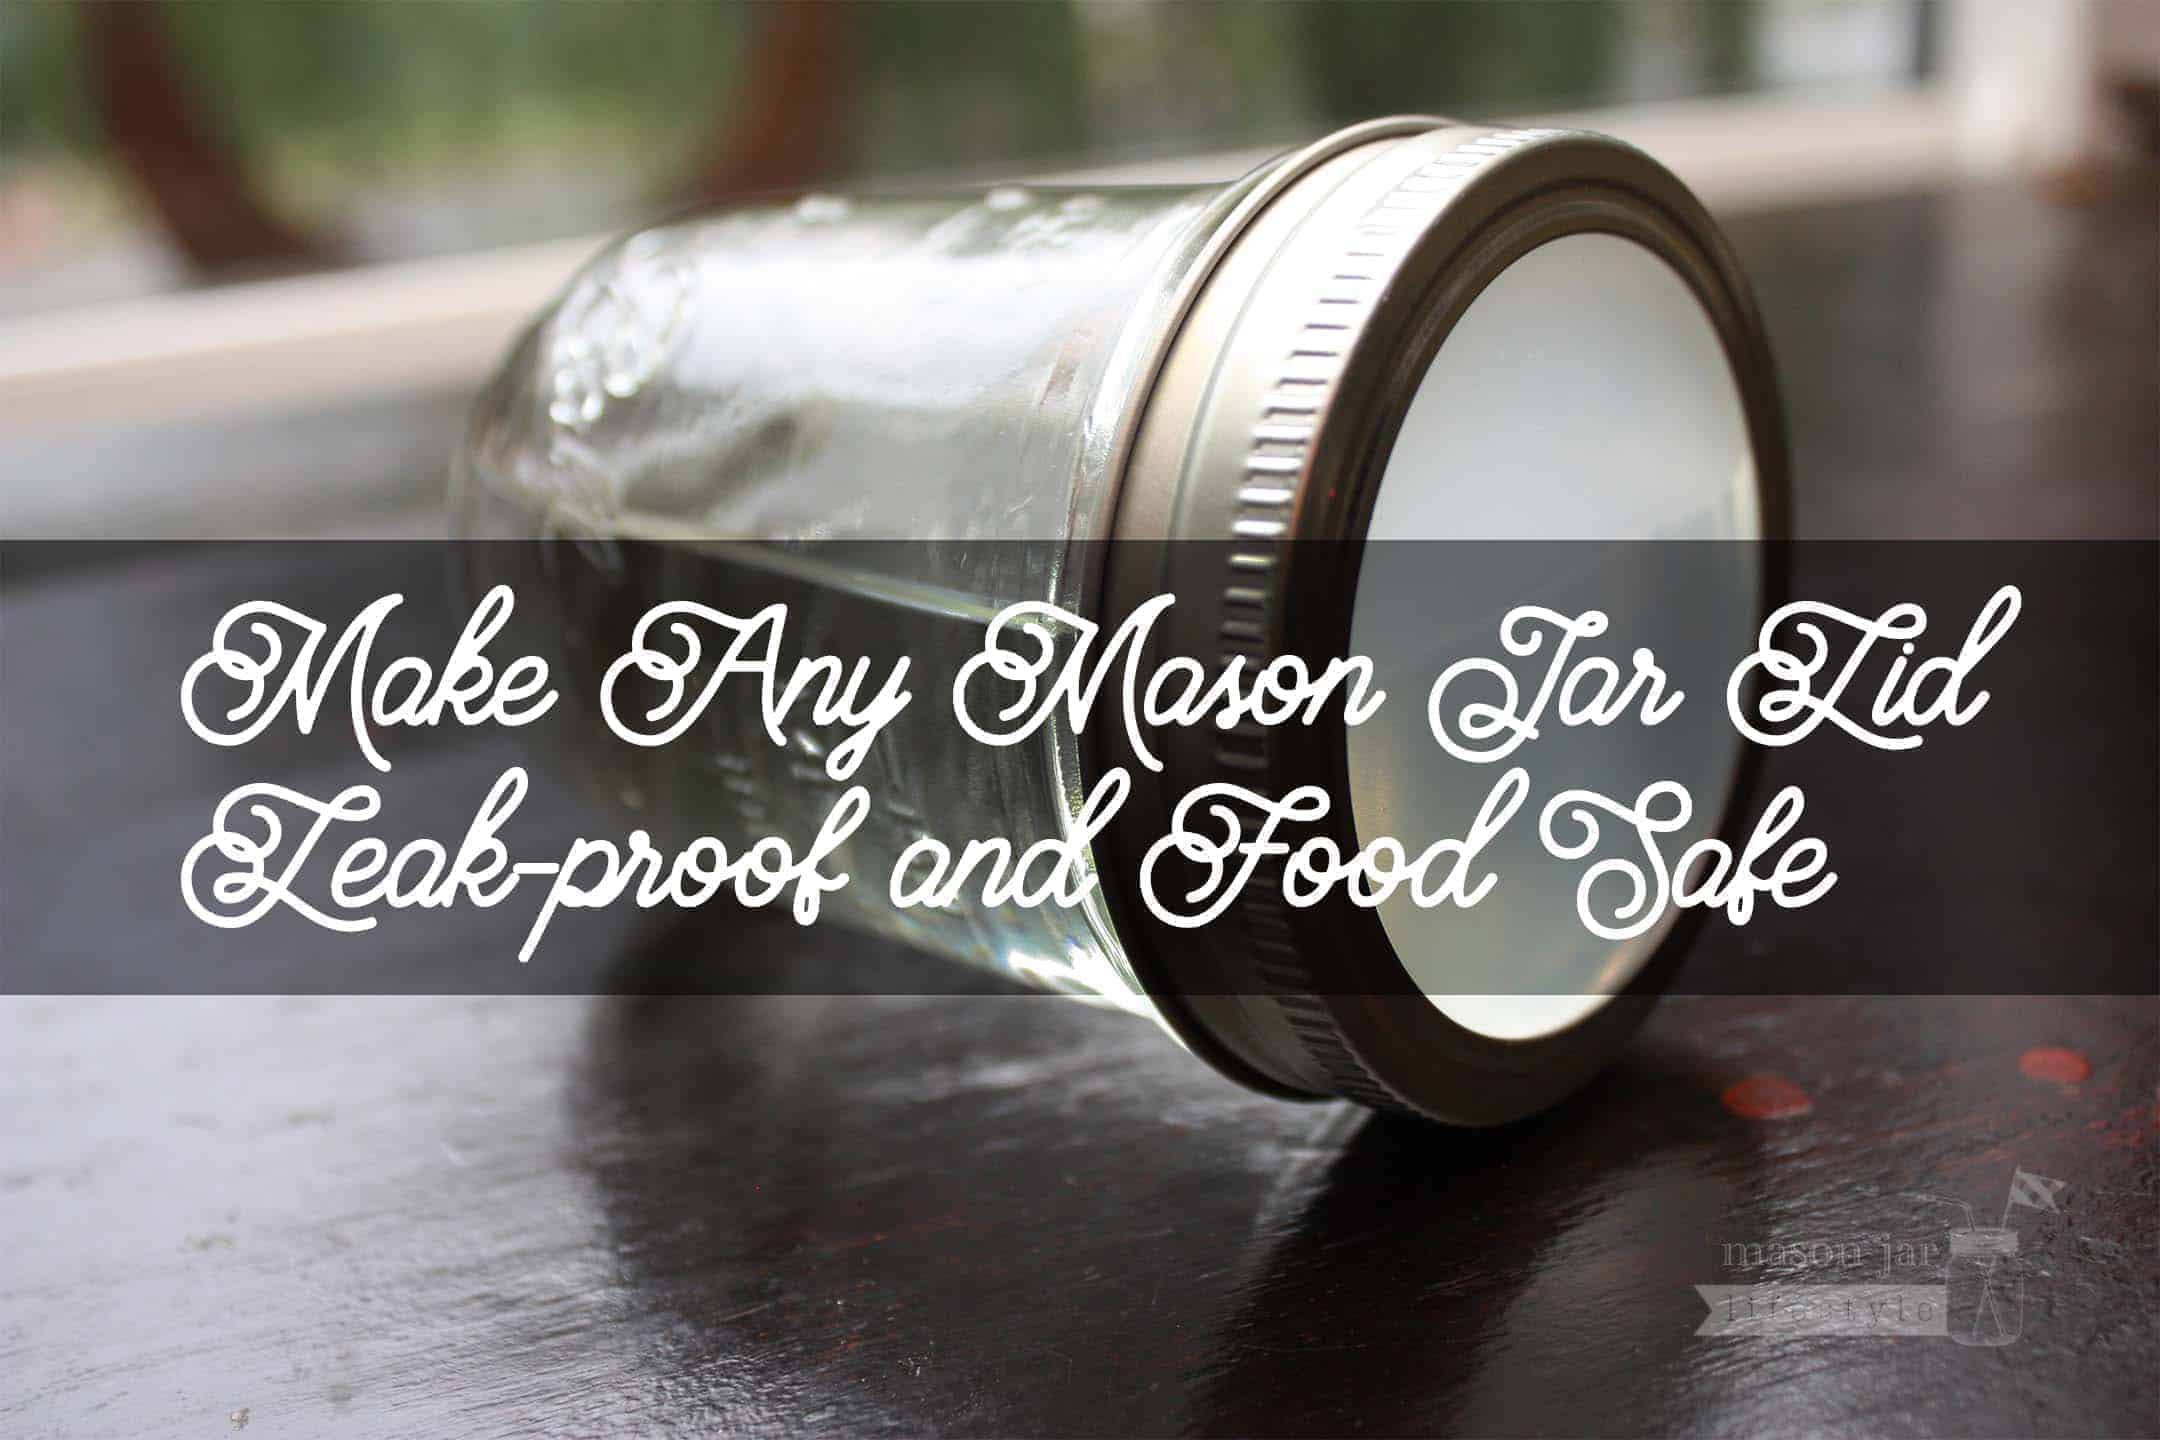 Make any Mason jar lid leak proof and food safe!